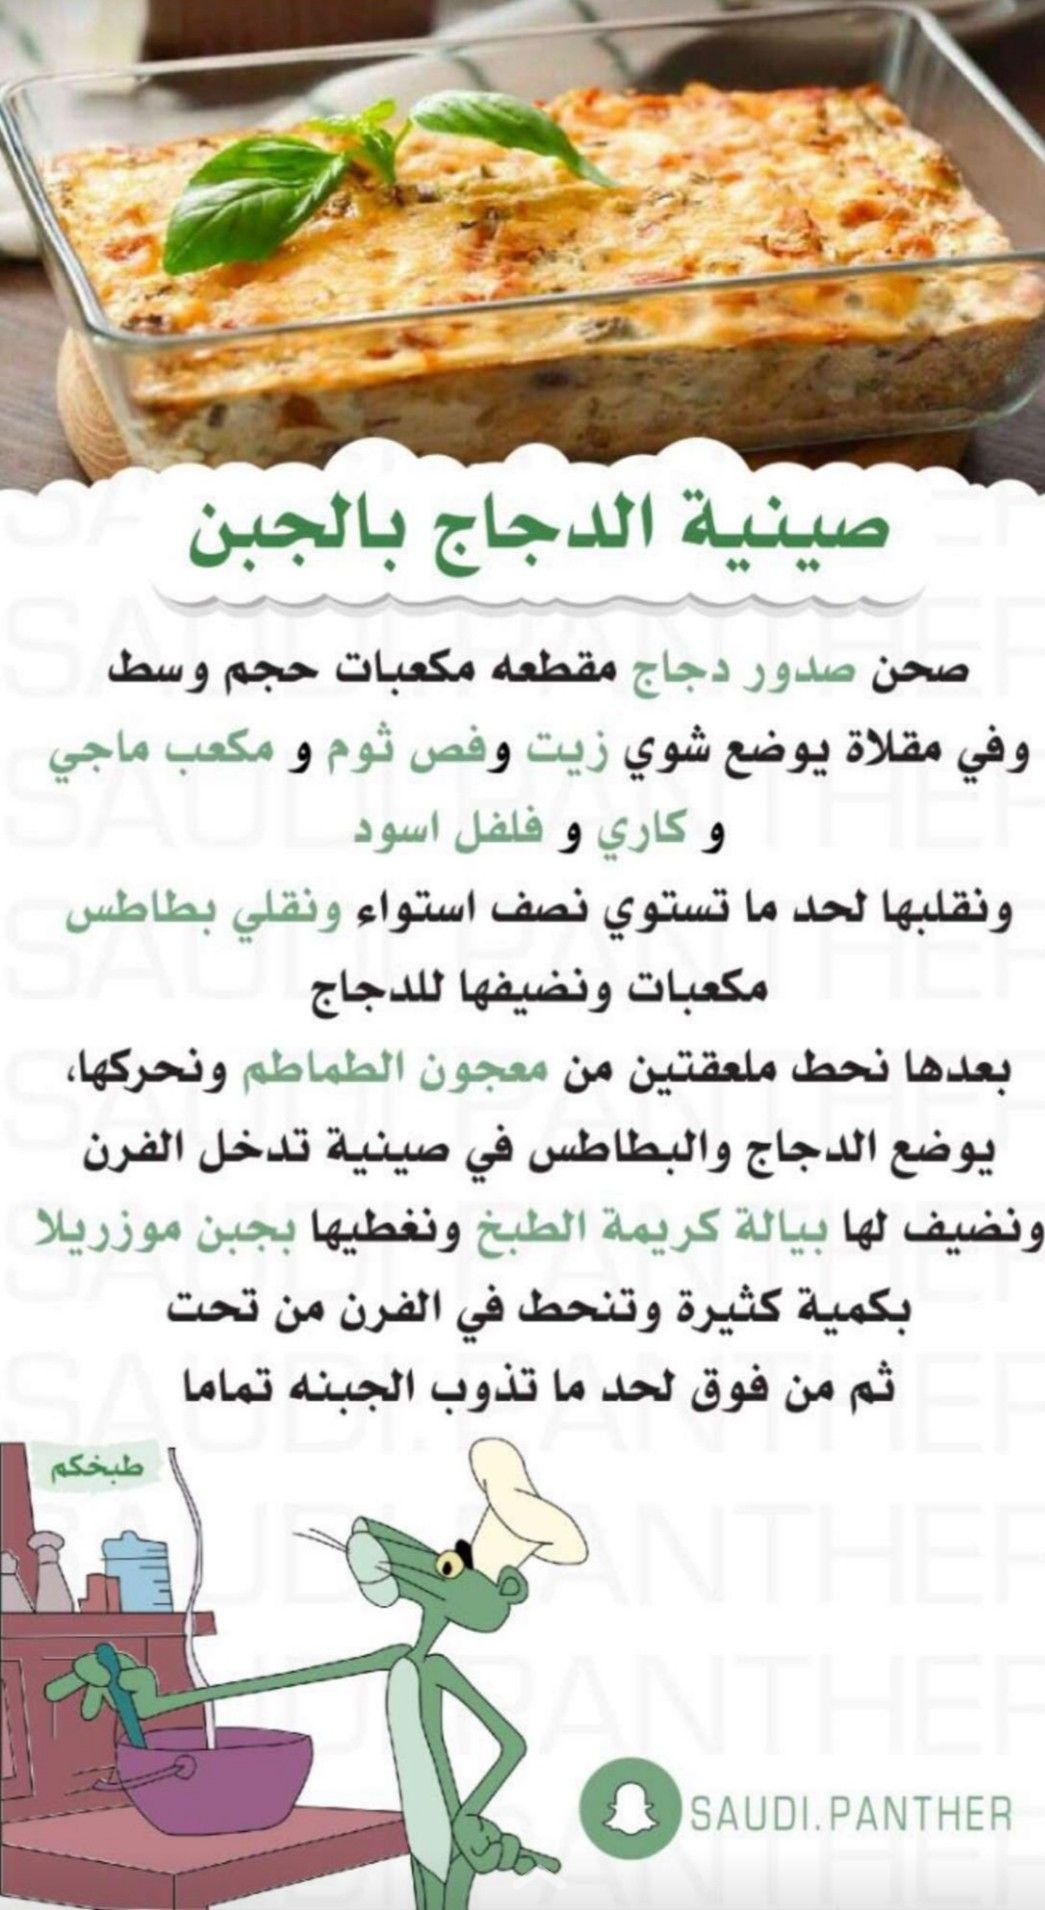 Pin By Shams Mohamed On اجمل الأكلات مع شمس محمد على Save Food Food Dishes Food Receipes